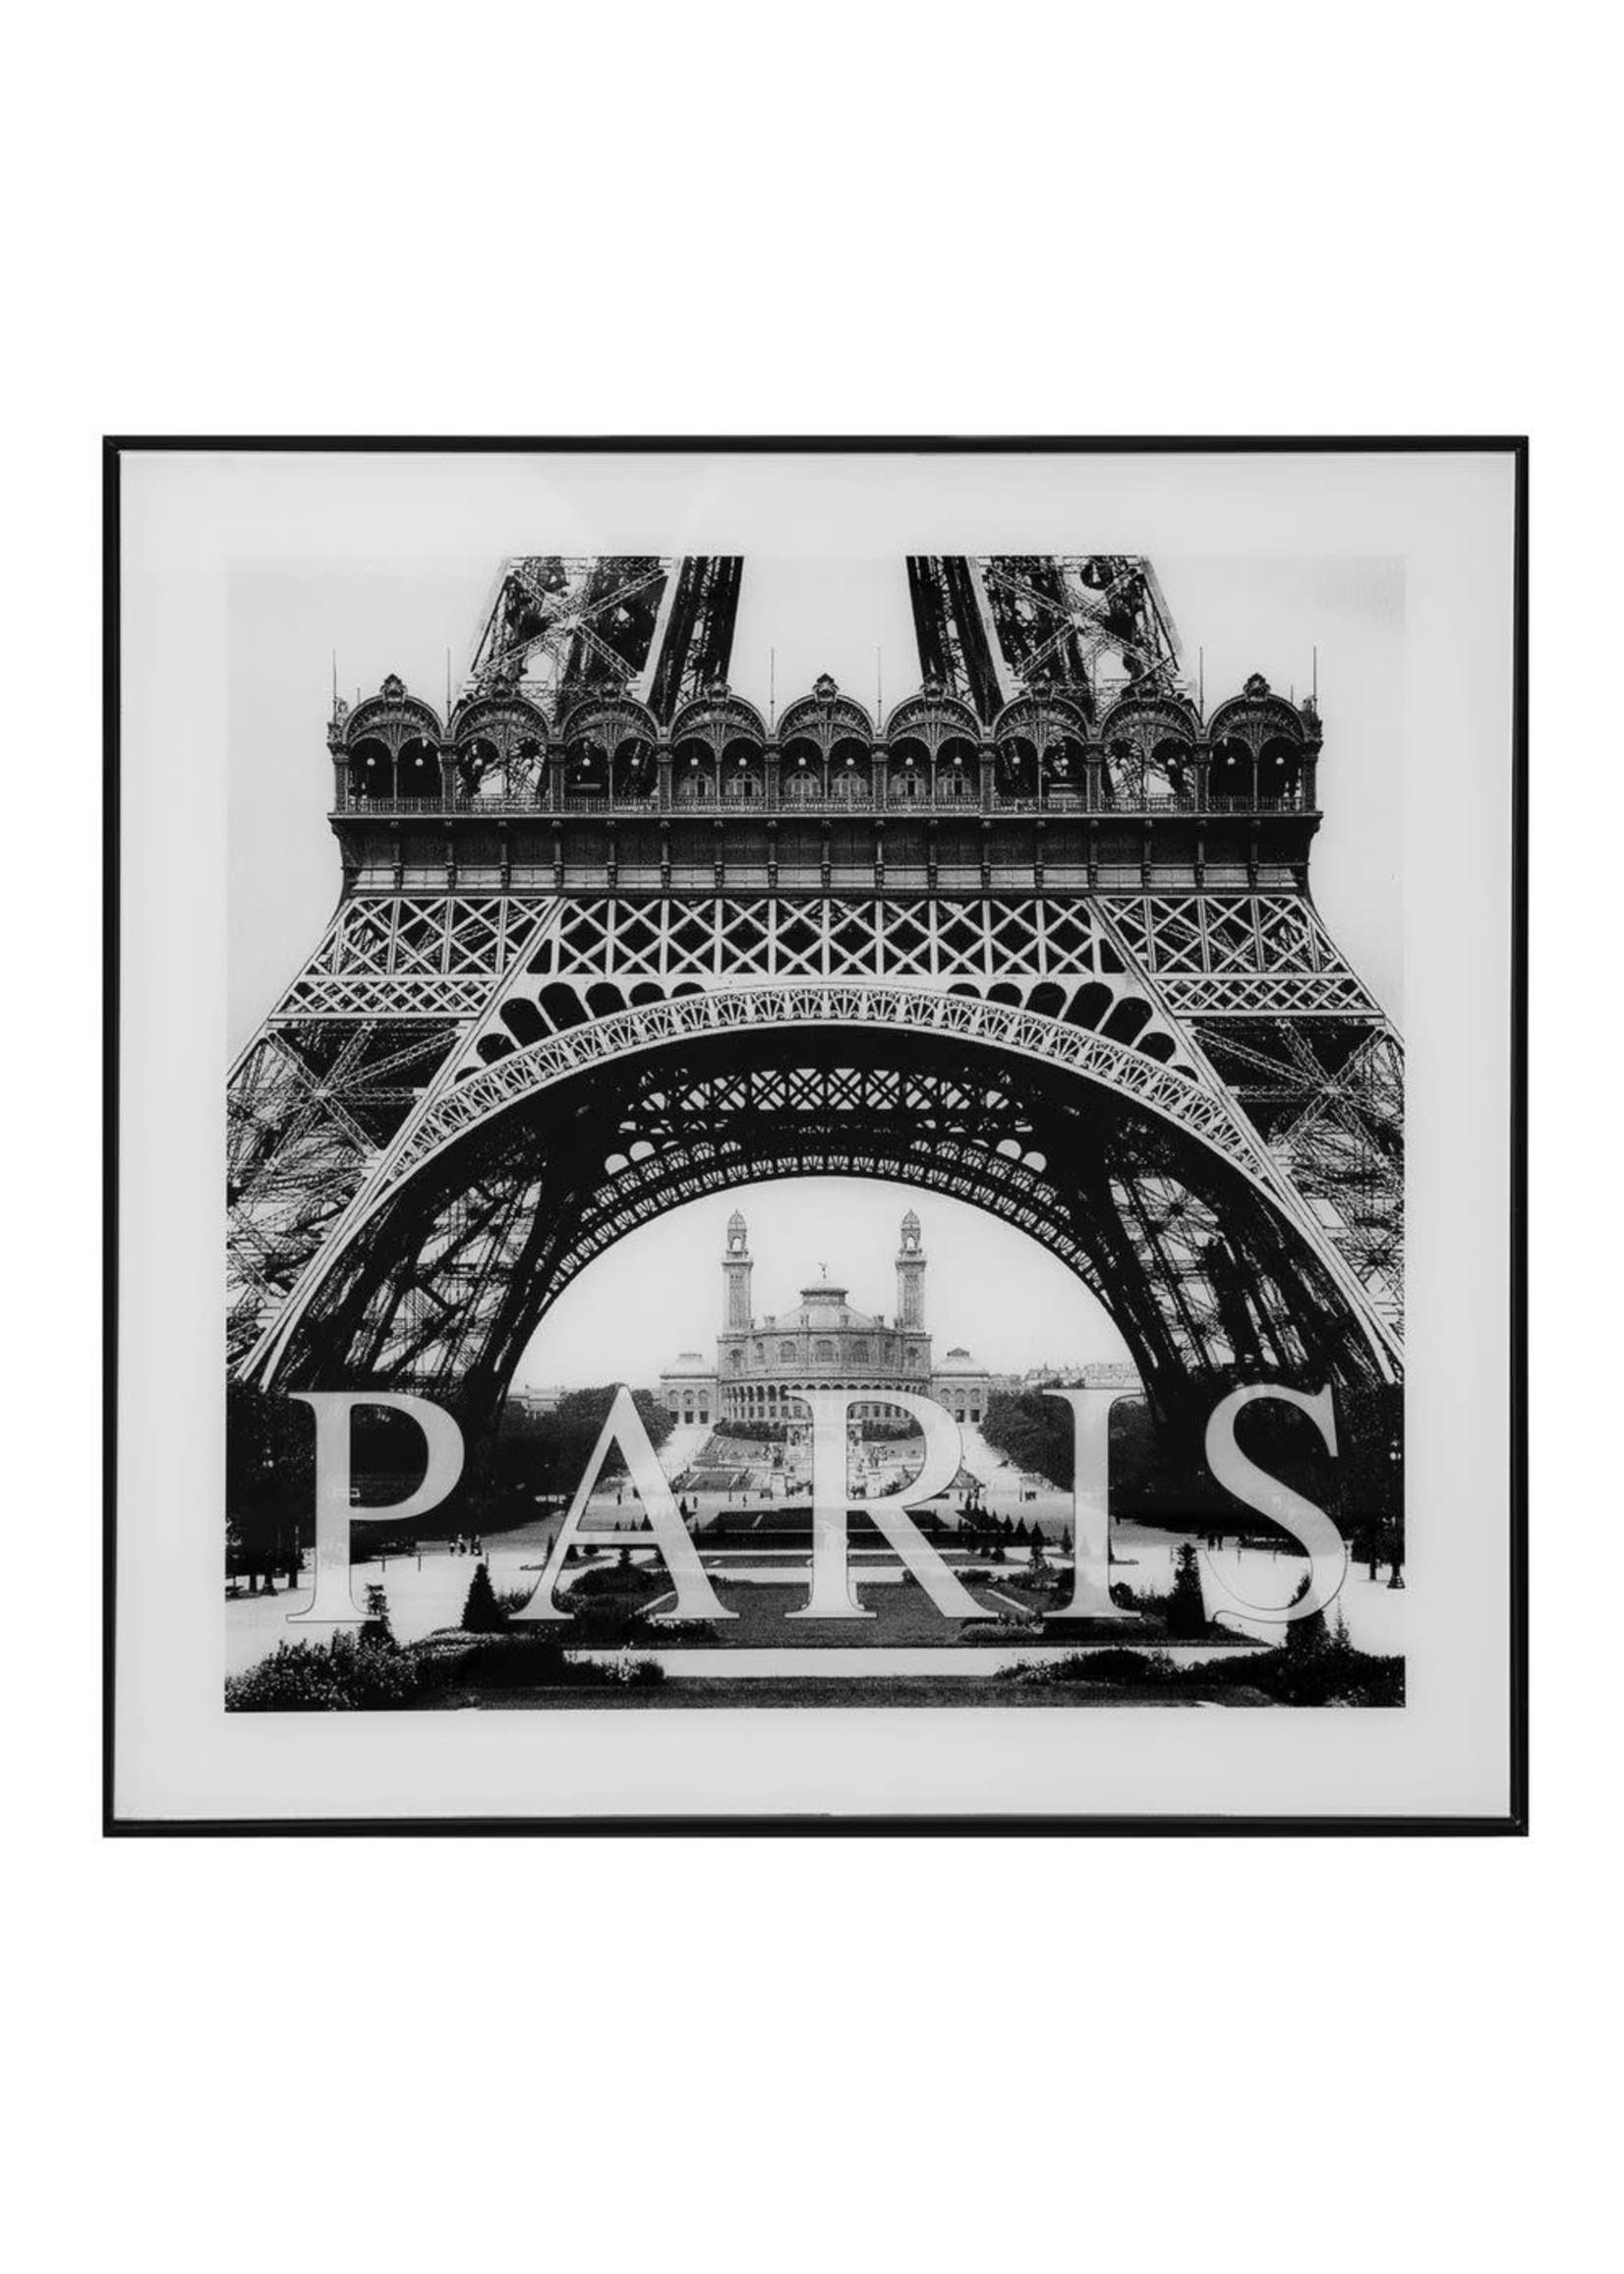 FRAMED GLASS LANDMARK WALL ART - PARIS